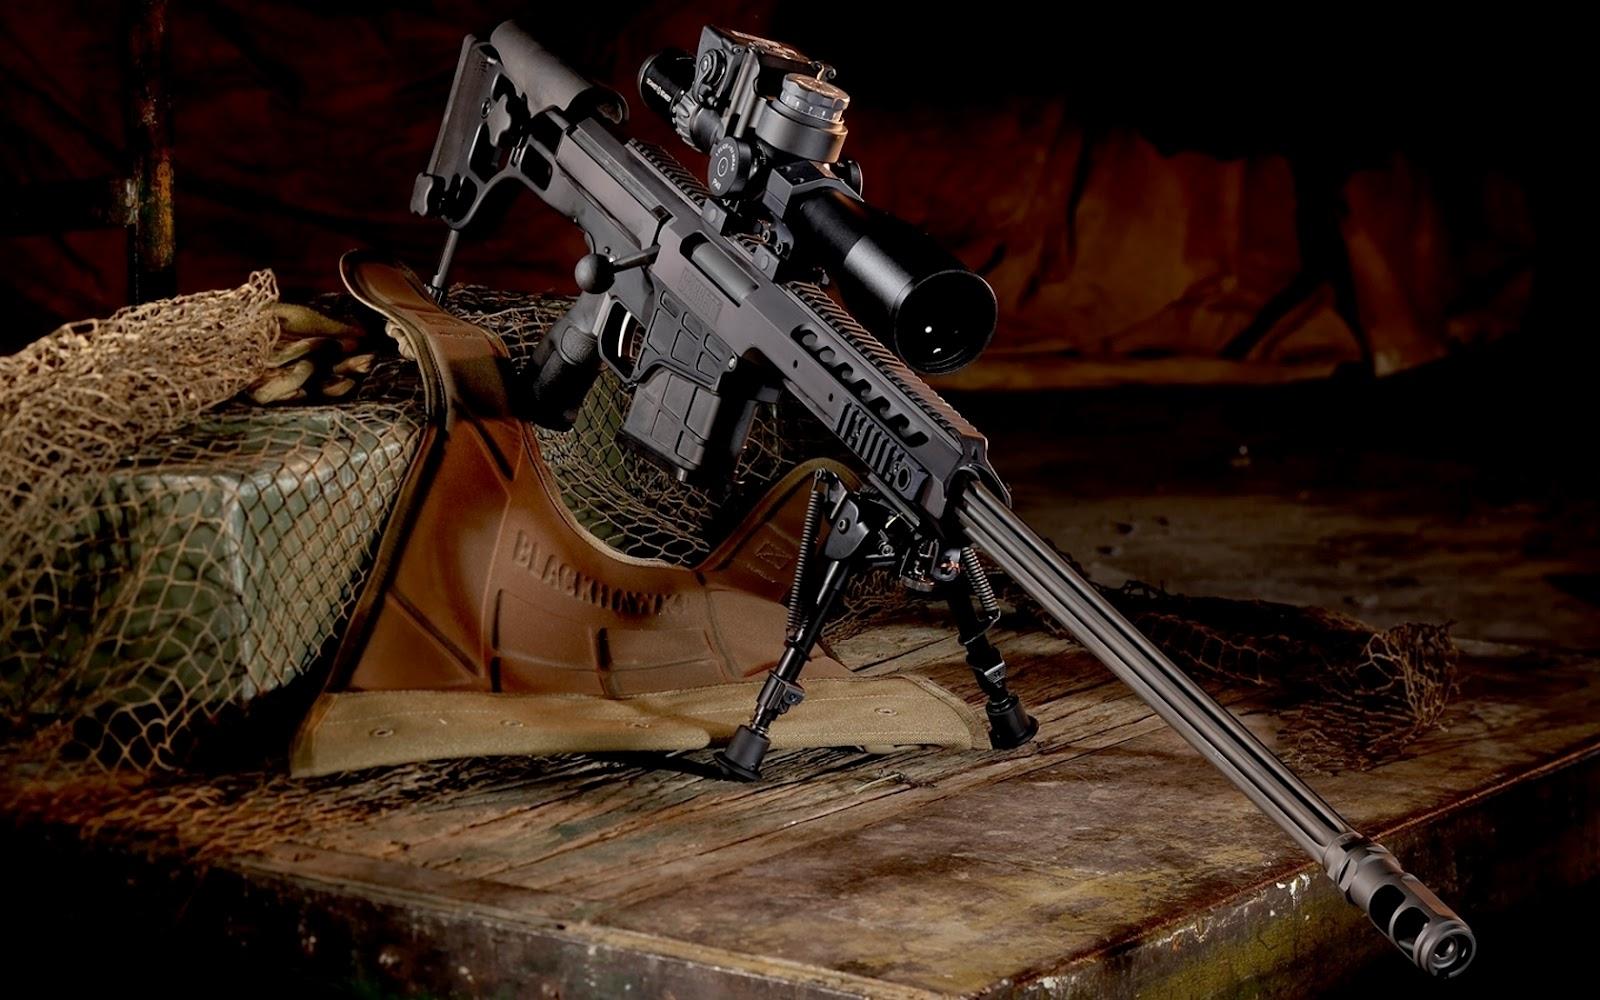 Sniper Rifle Wallpapers HD - Wallpaper Cave |Sniper Rifle Wallpaper